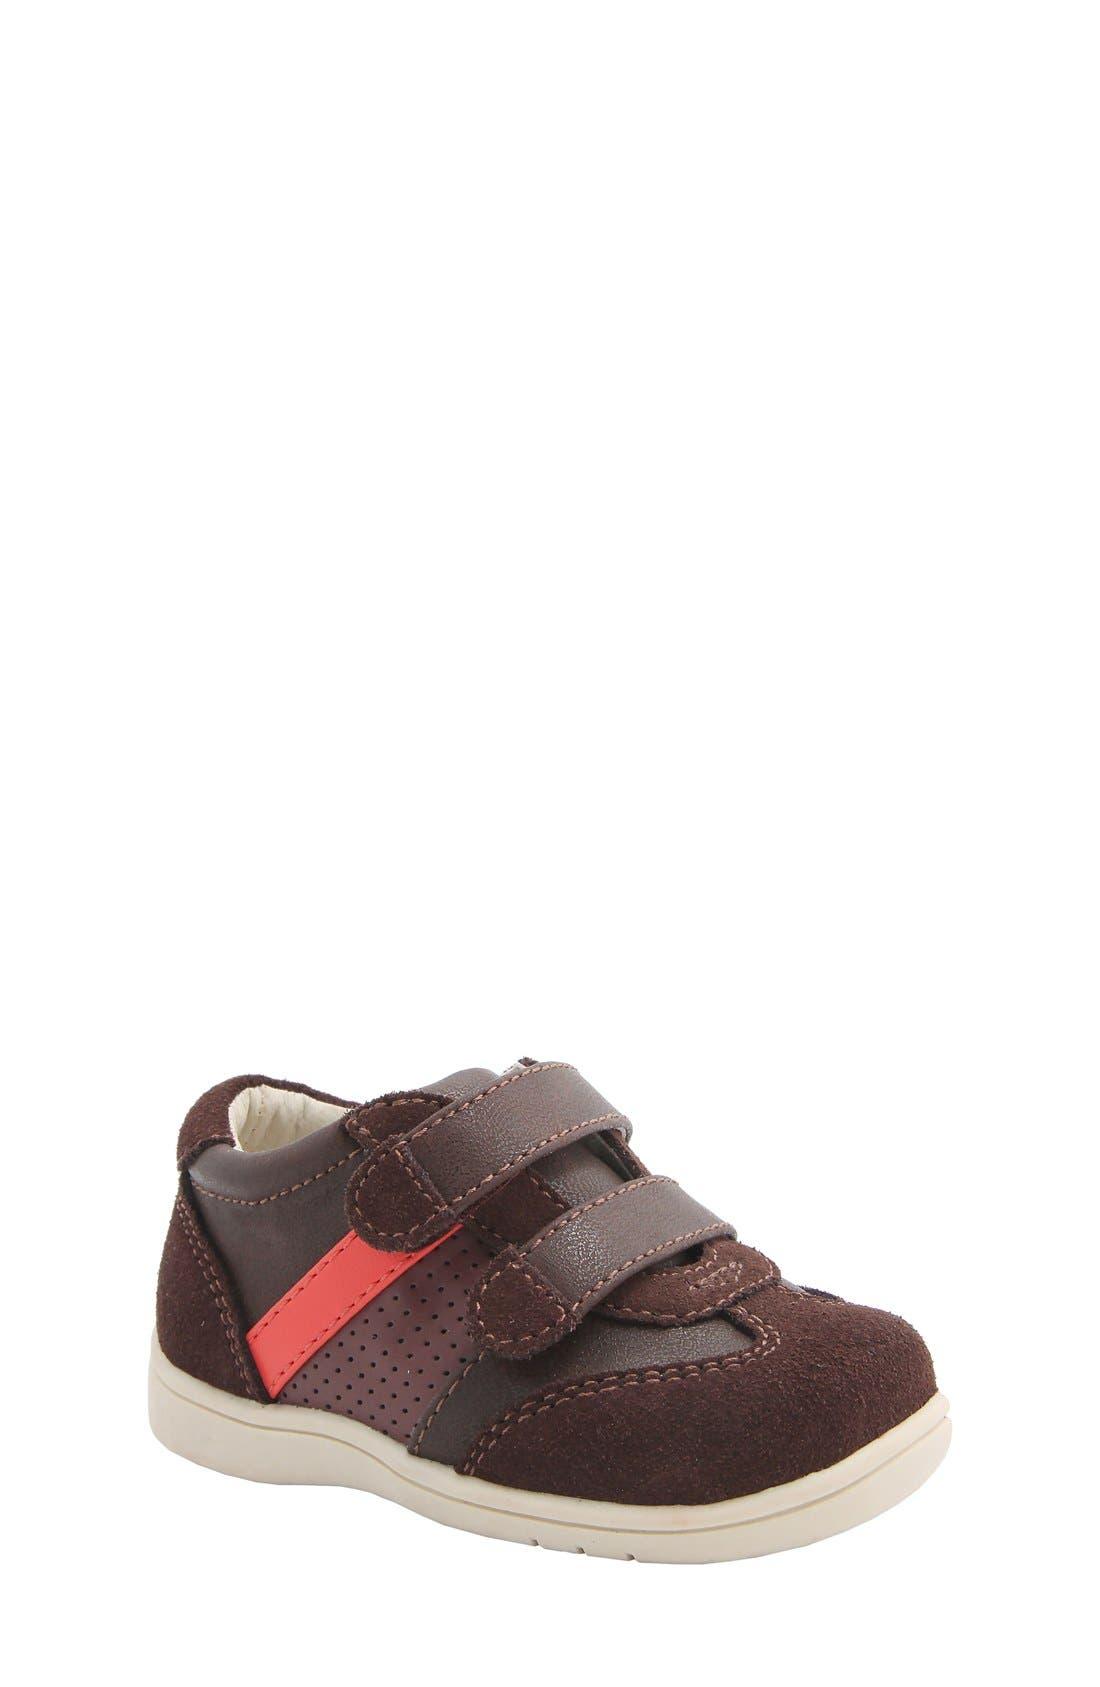 Alternate Image 1 Selected - Nina 'Everest' Sneaker (Baby & Walker)